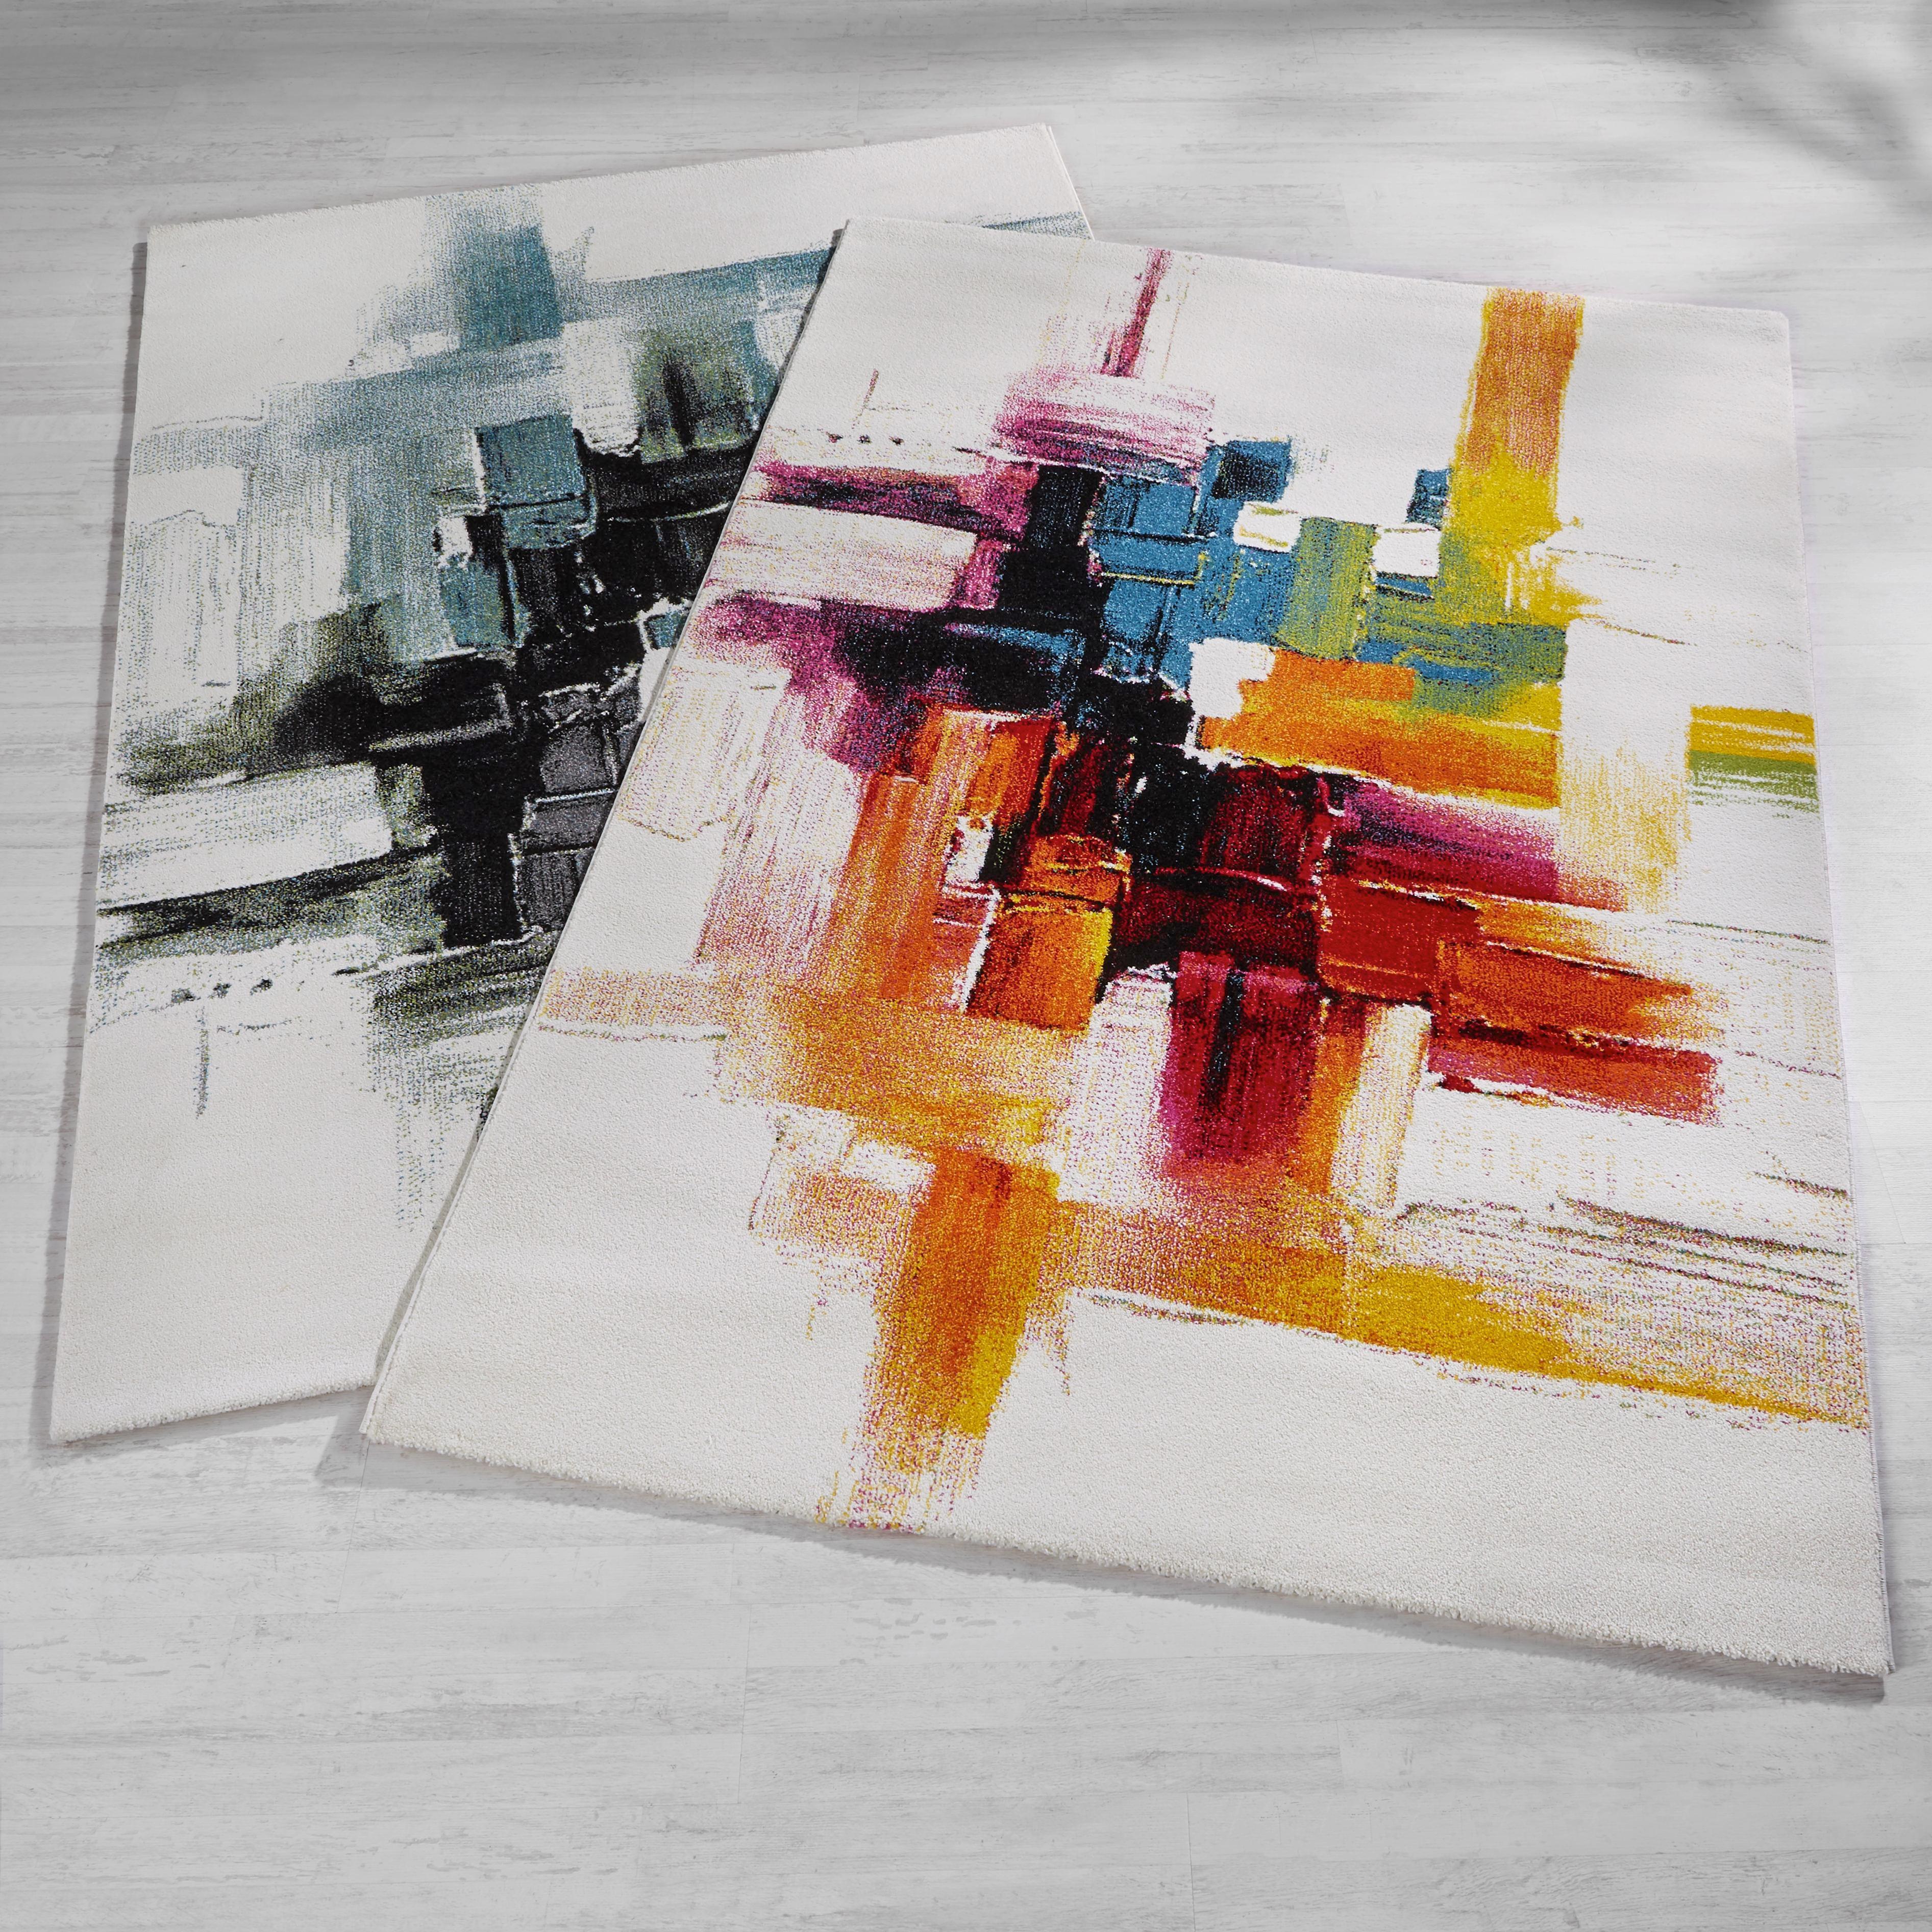 Webteppich abstract ca. 160x230cm - Blau/Schwarz, LIFESTYLE, Textil (160/230cm) - MÖMAX modern living